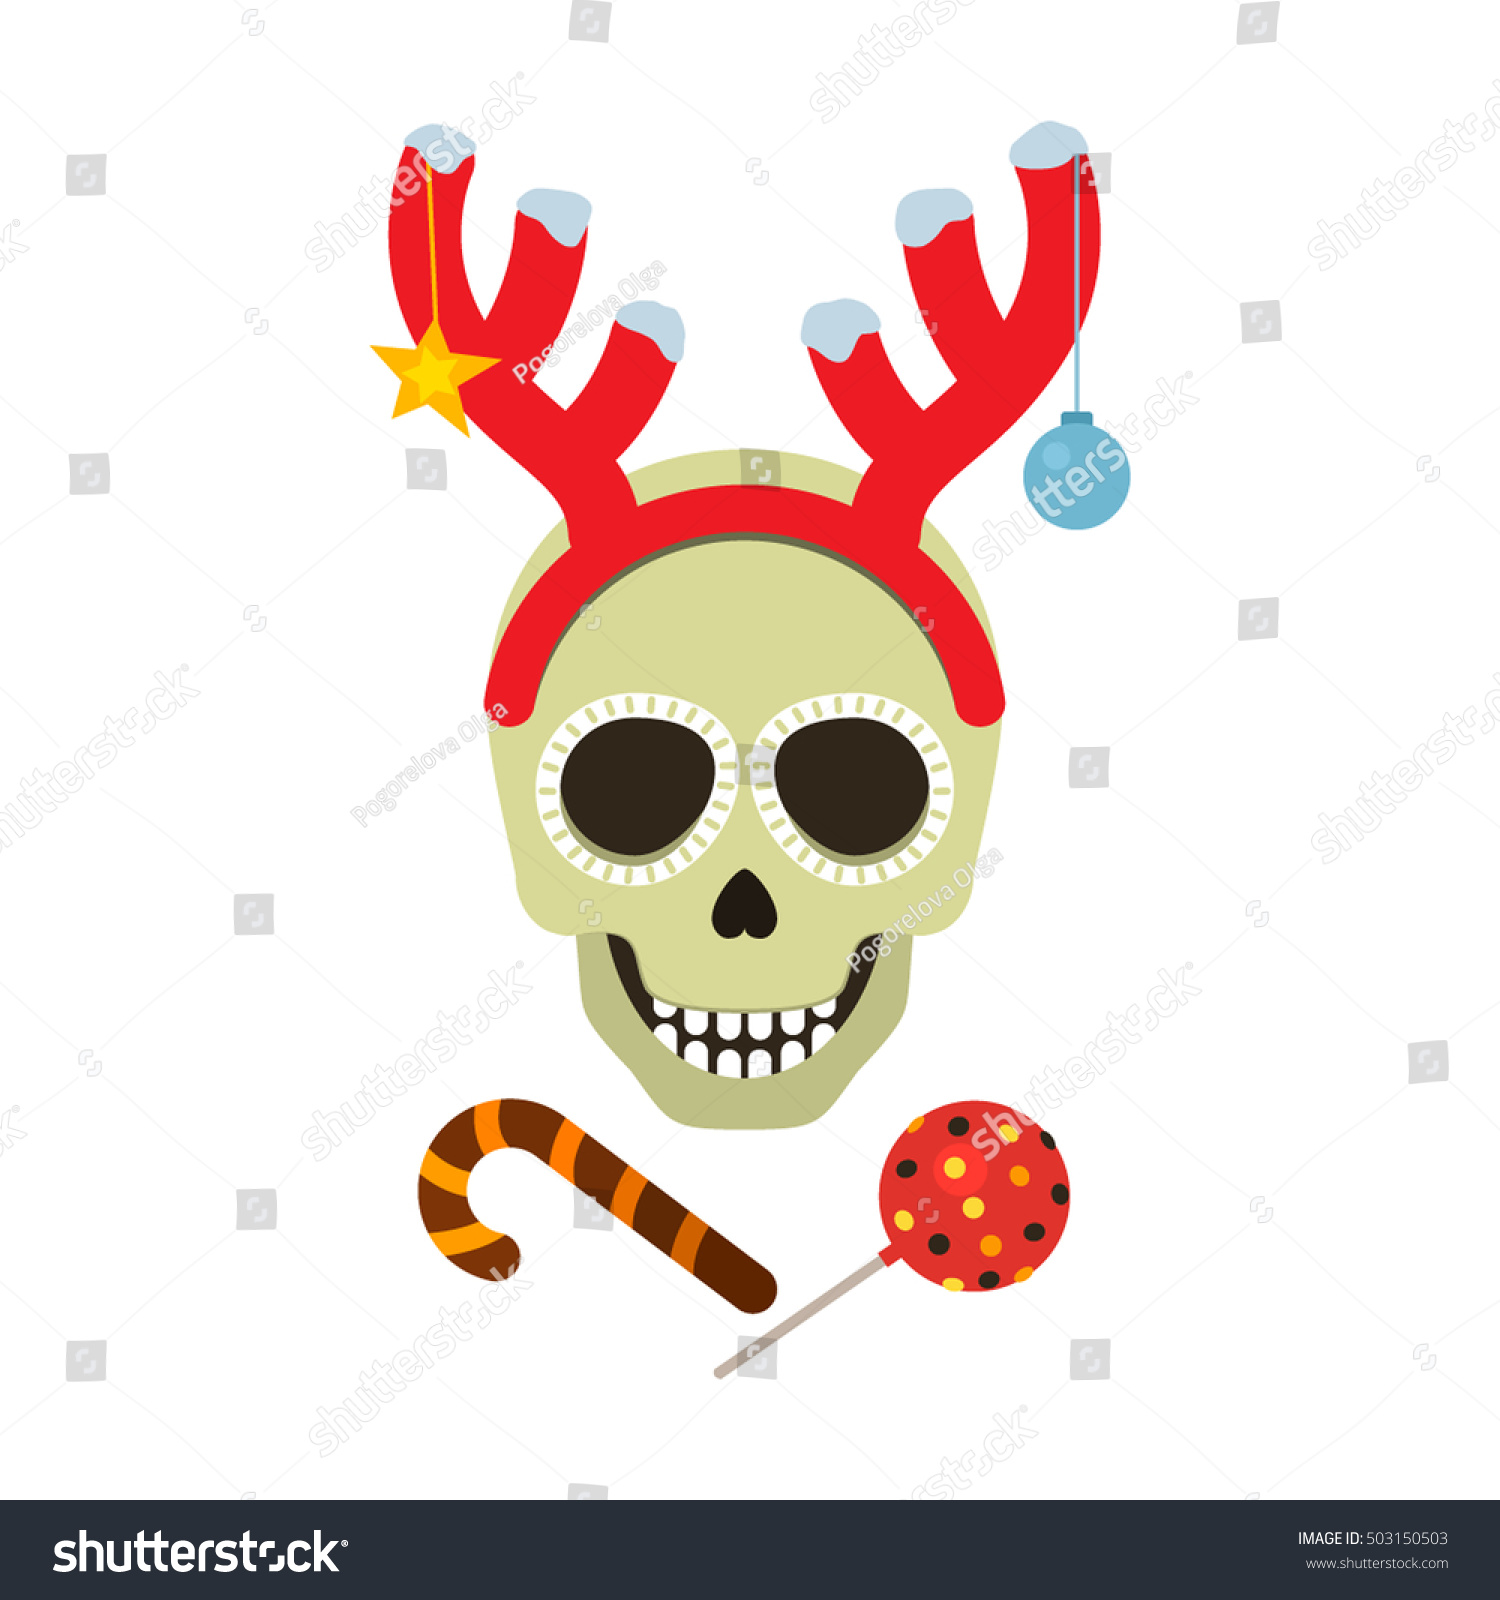 Festive Print On Halloween Christmas Card Stock Vector (Royalty Free ...